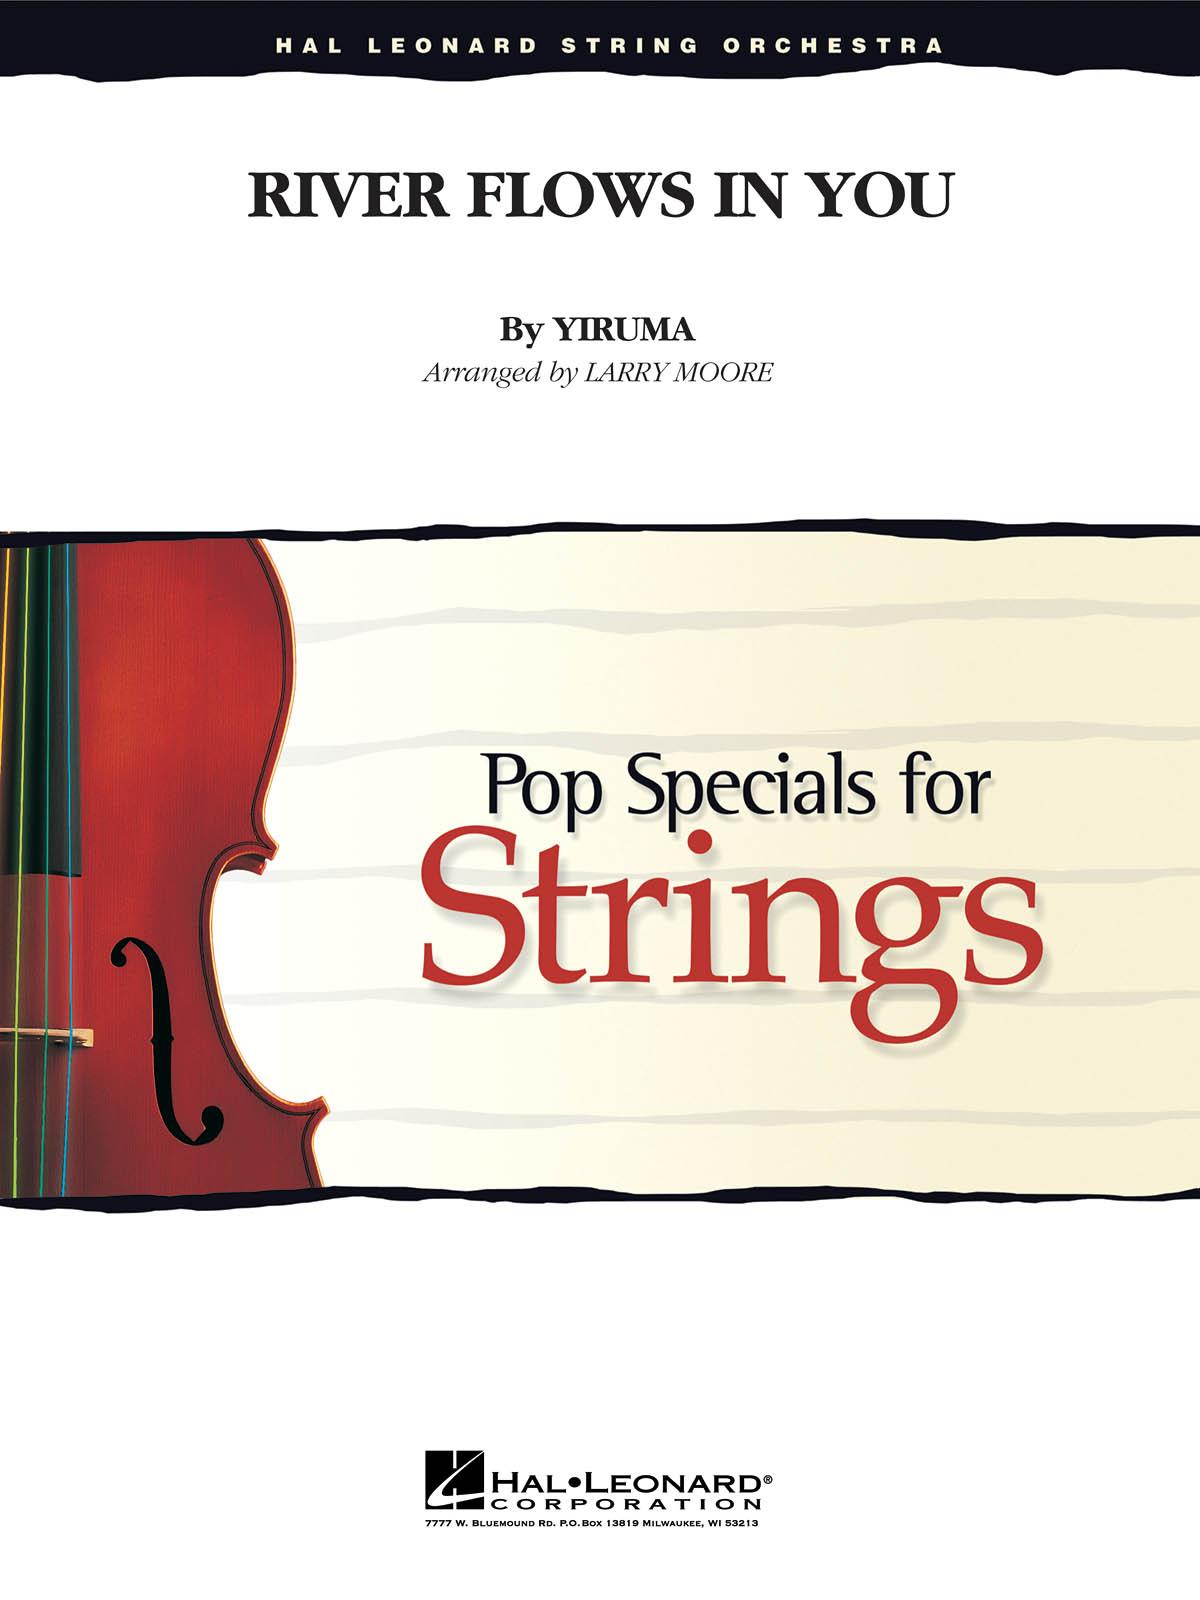 Yiruma: River Flows In You: String Ensemble: Score & Parts